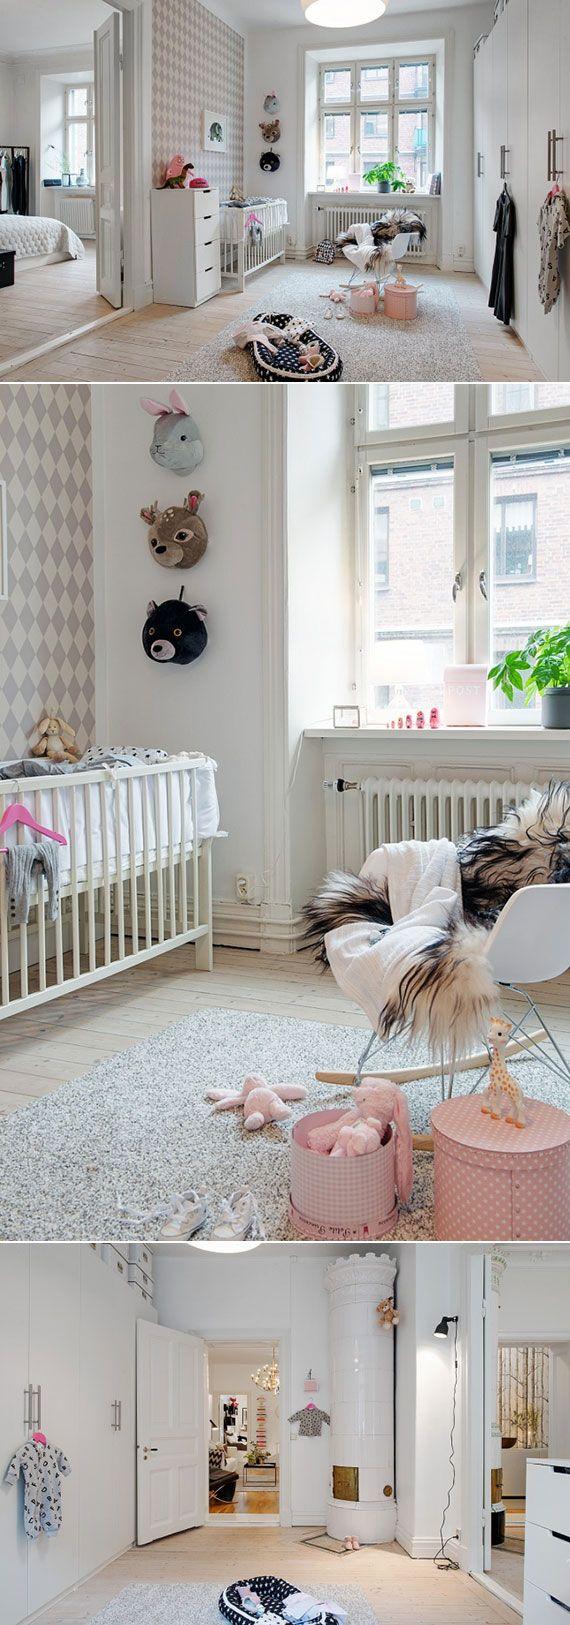 nursery inspiration  Baby Nursery  Pinterest  Baby girls, Girls and ...